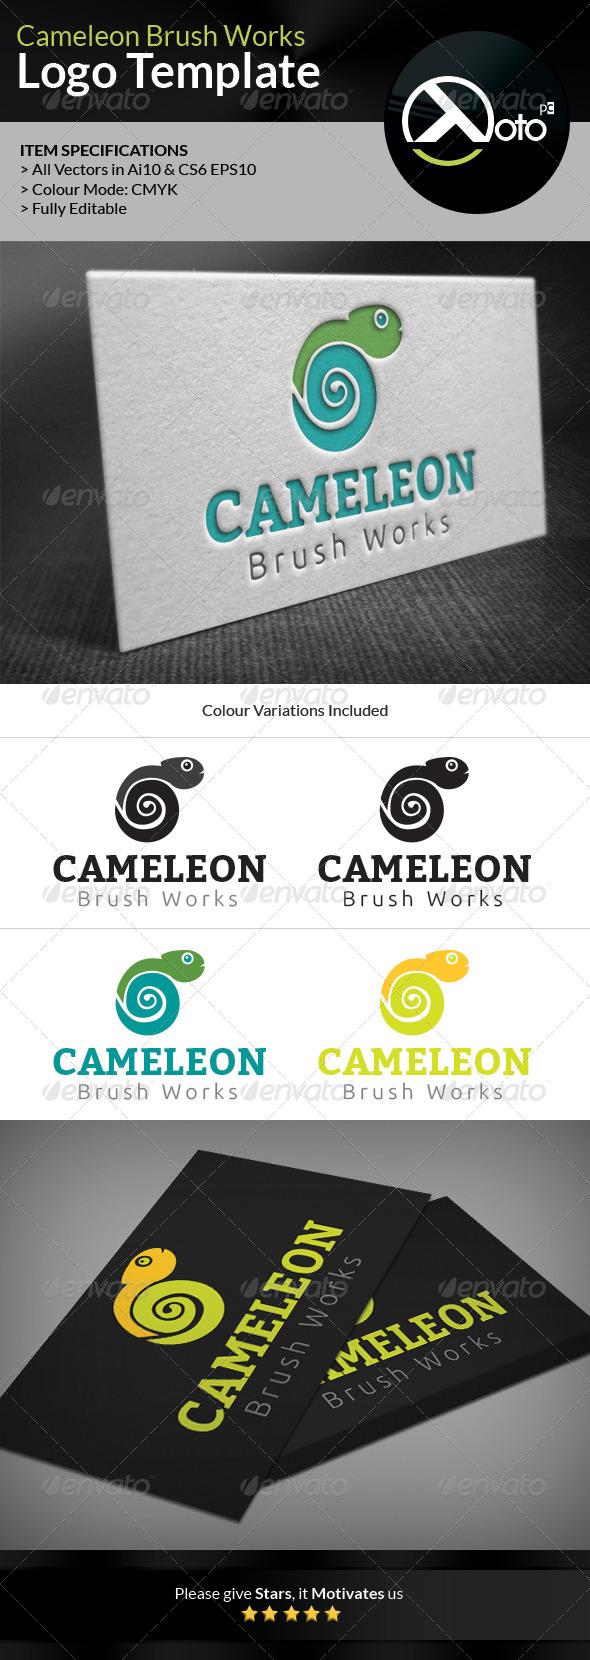 GraphicRiver Cameleon Brush Works Logo 6605312